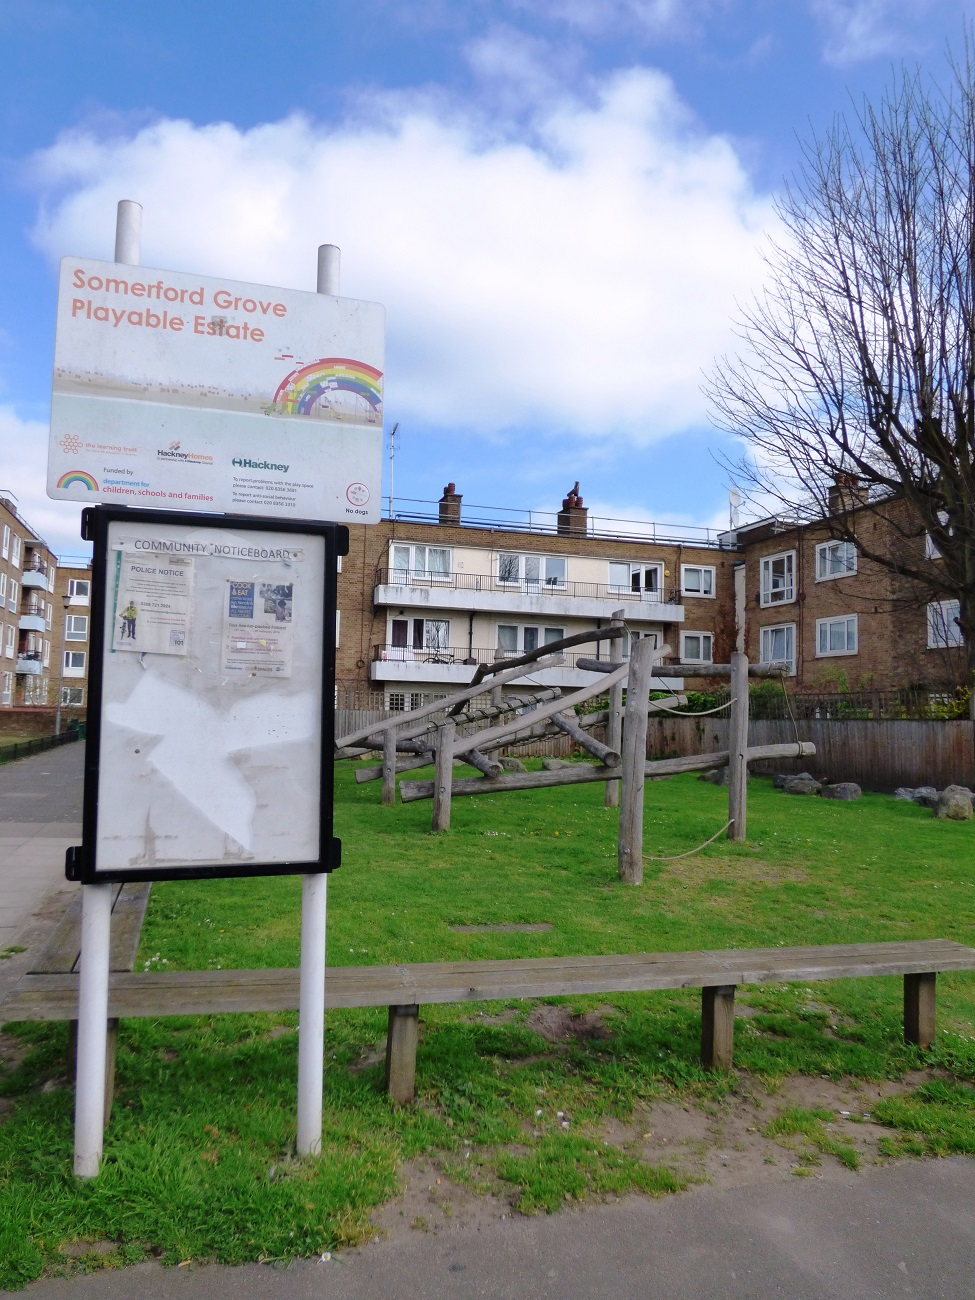 20170402_Hackney_Somerford-Grove-Playable-Estate_Somerford-Grove-Playable-Estate